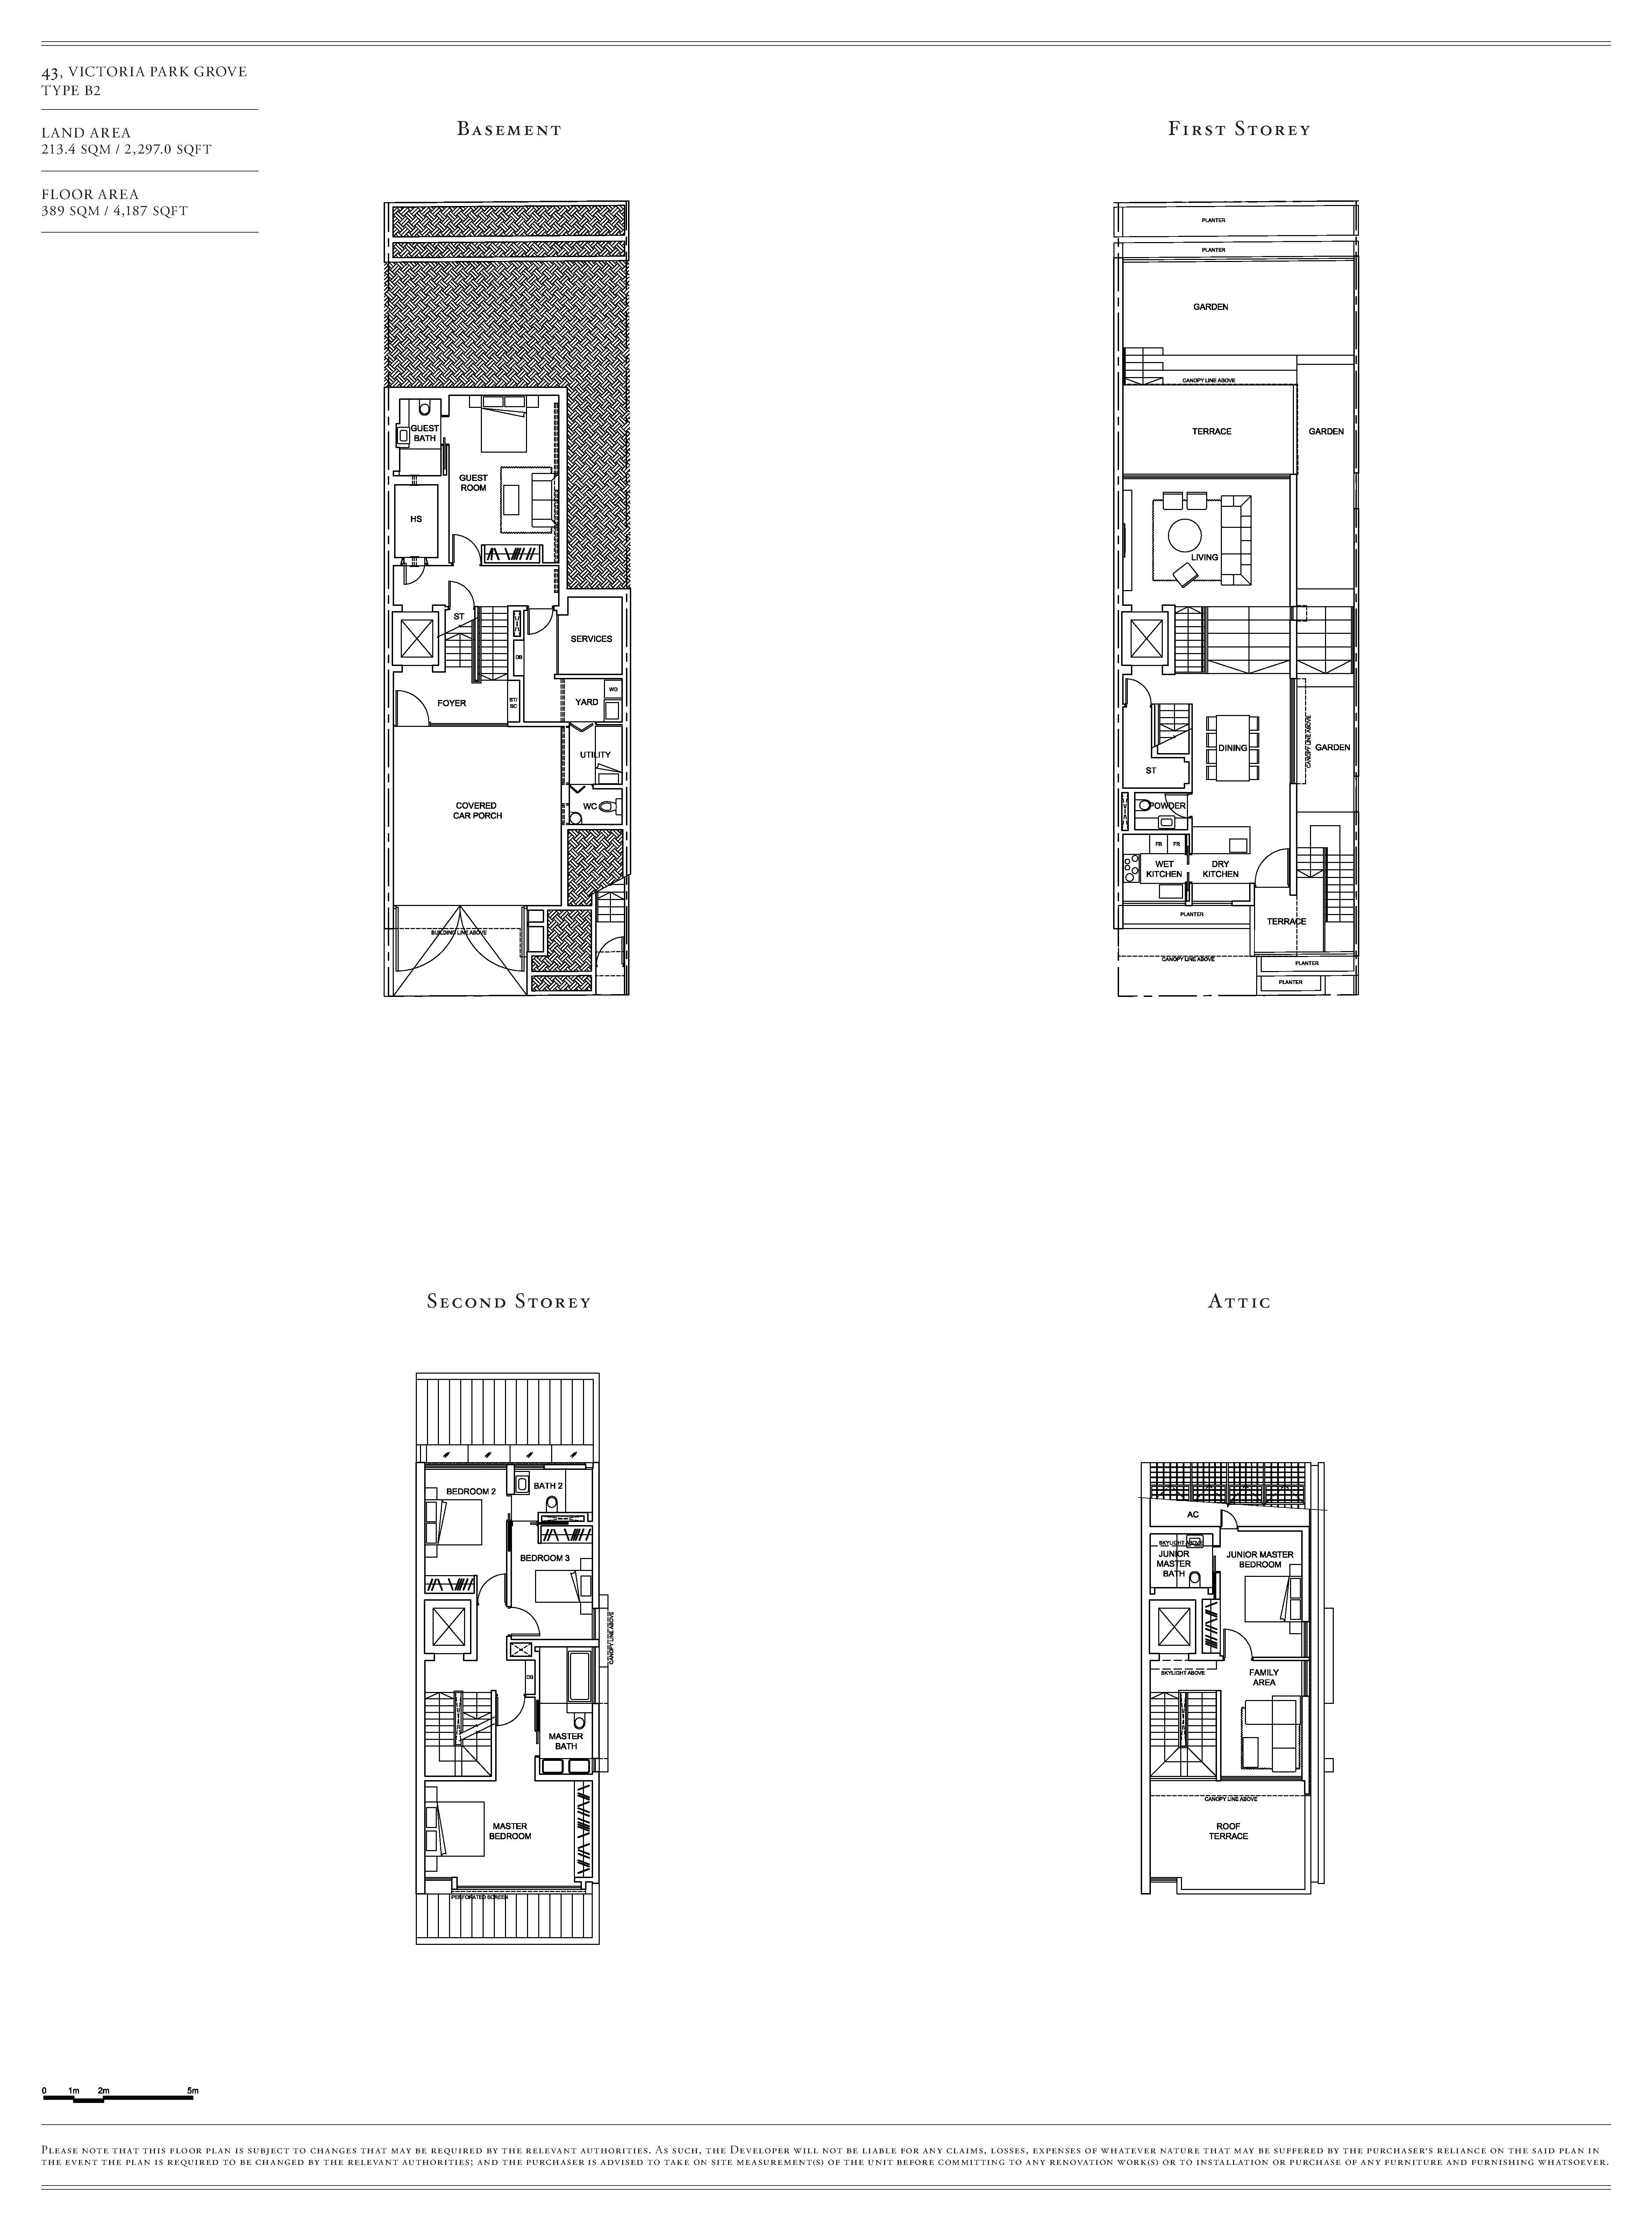 Victoria Park Villas House 43 Type B2 Floor Plans